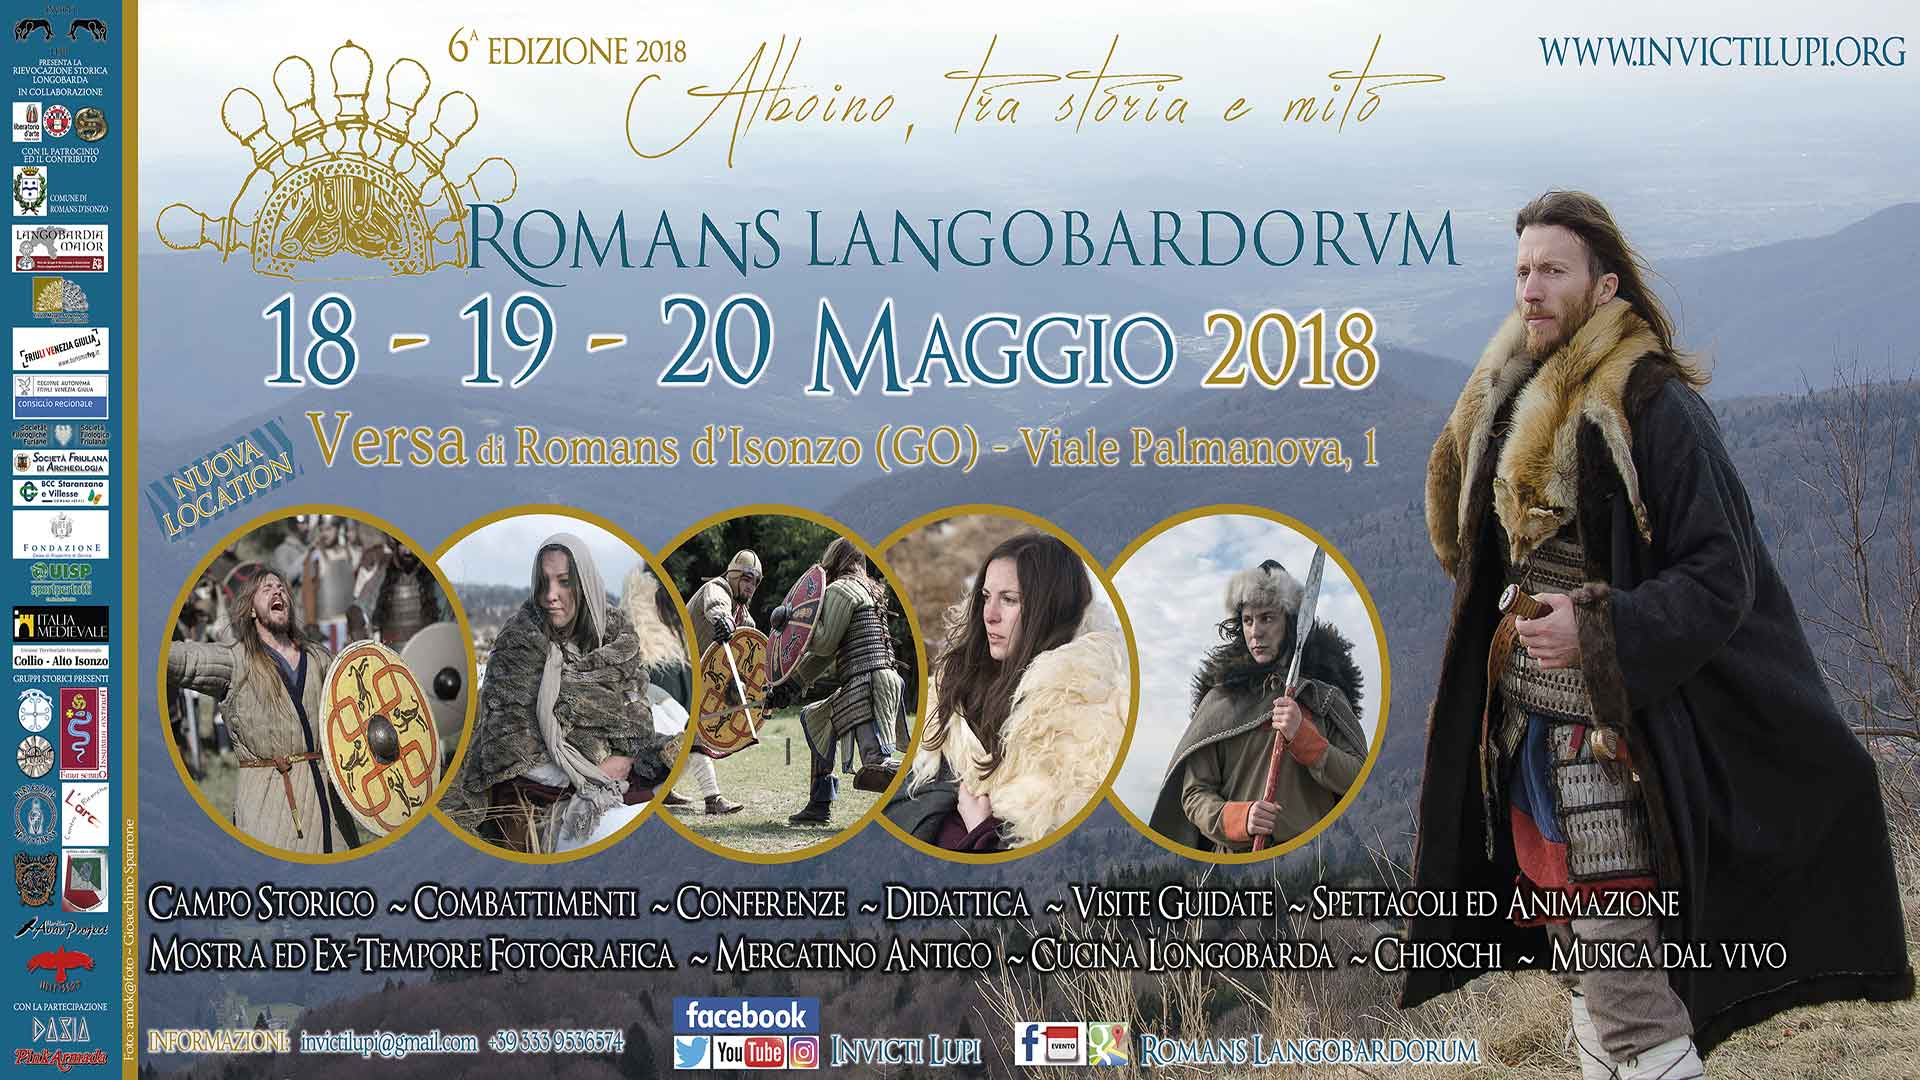 VI Ed. Romans Langobardorum - extempore fotografica